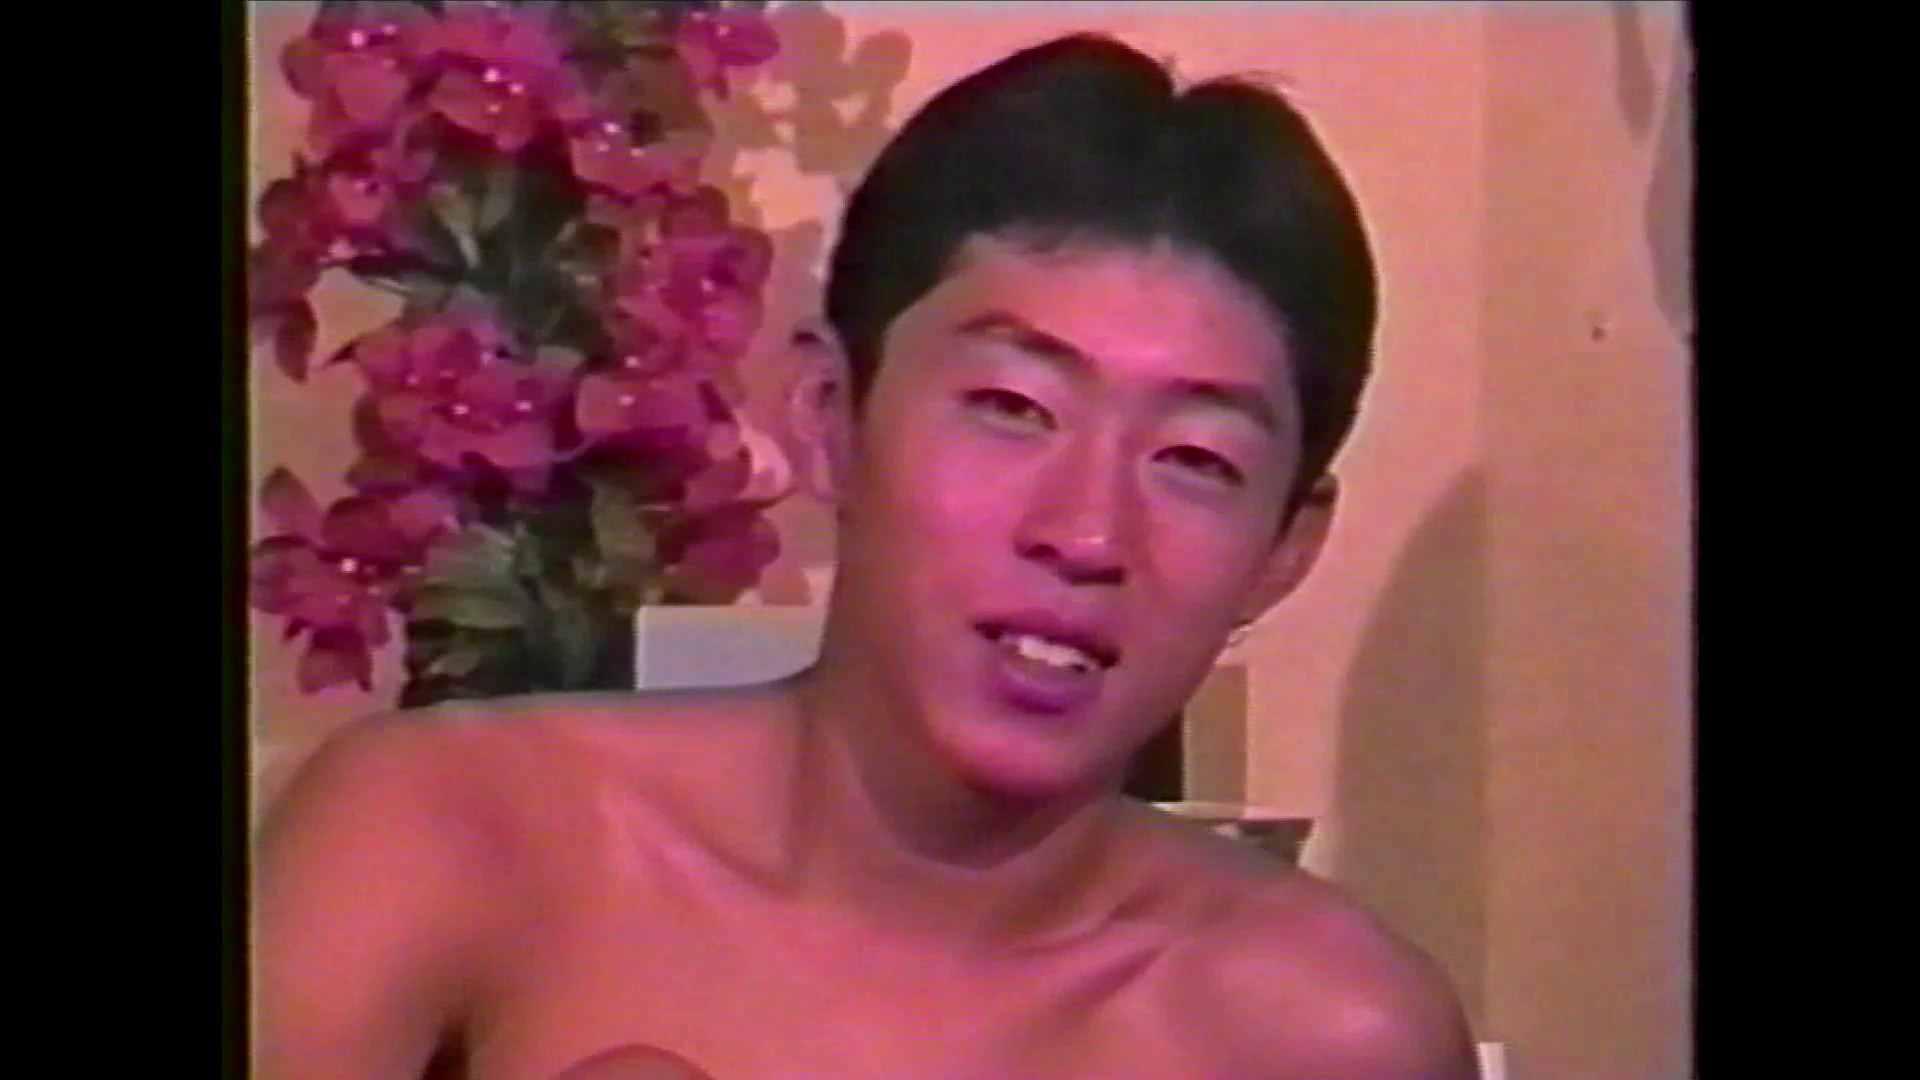 GAYBOY宏のオカズ倉庫Vol.12-2 ノンケ君達の・・ 尻マンコ画像 78枚 14